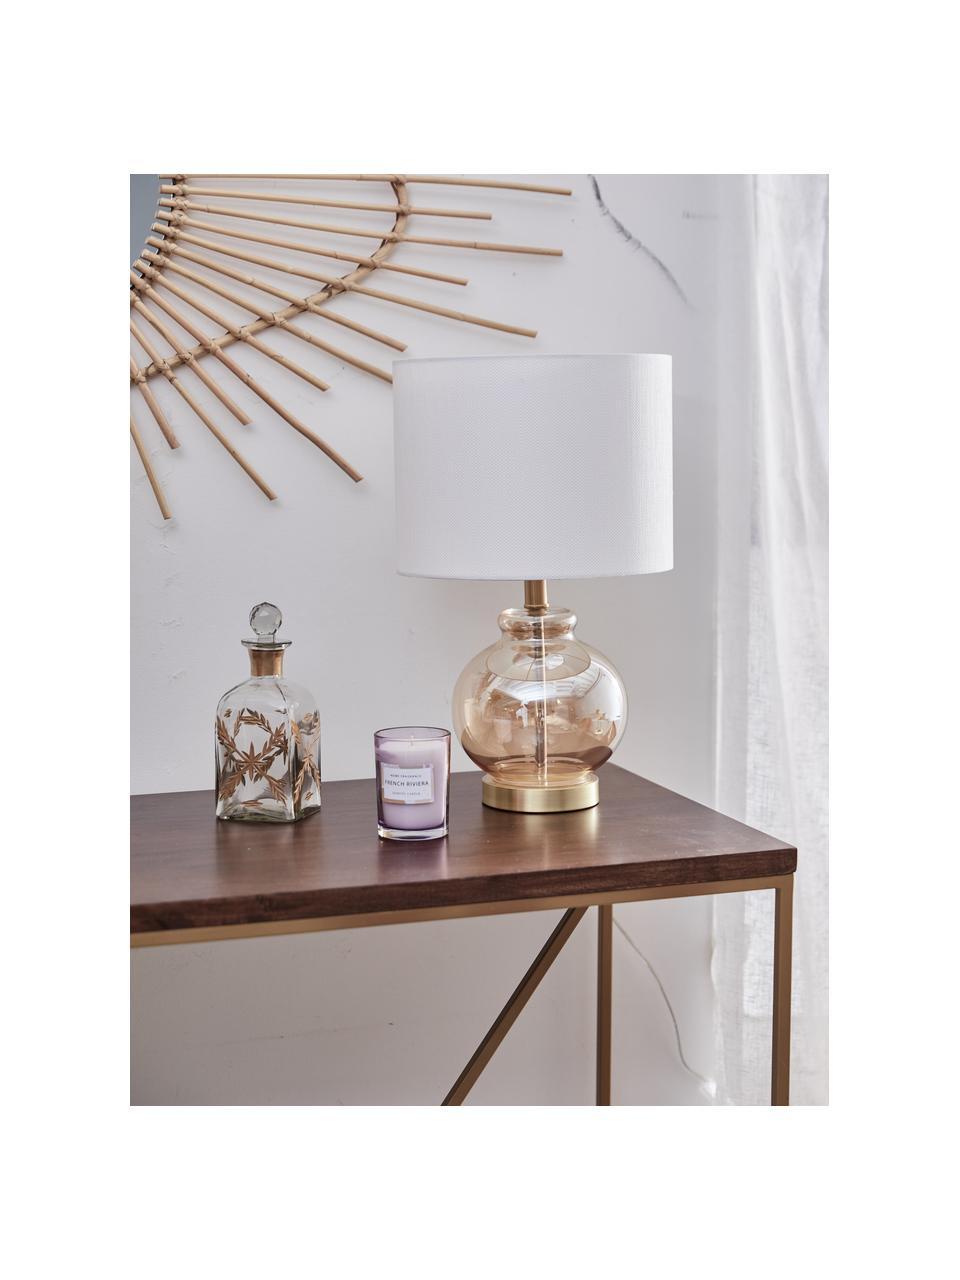 Tafellamp Natty met glazen onderstel, Lampenkap: textiel, Lampvoet: glas, Voetstuk: geborsteld messing, Wit, amberkleurig, transparant, Ø 31 x H 48 cm